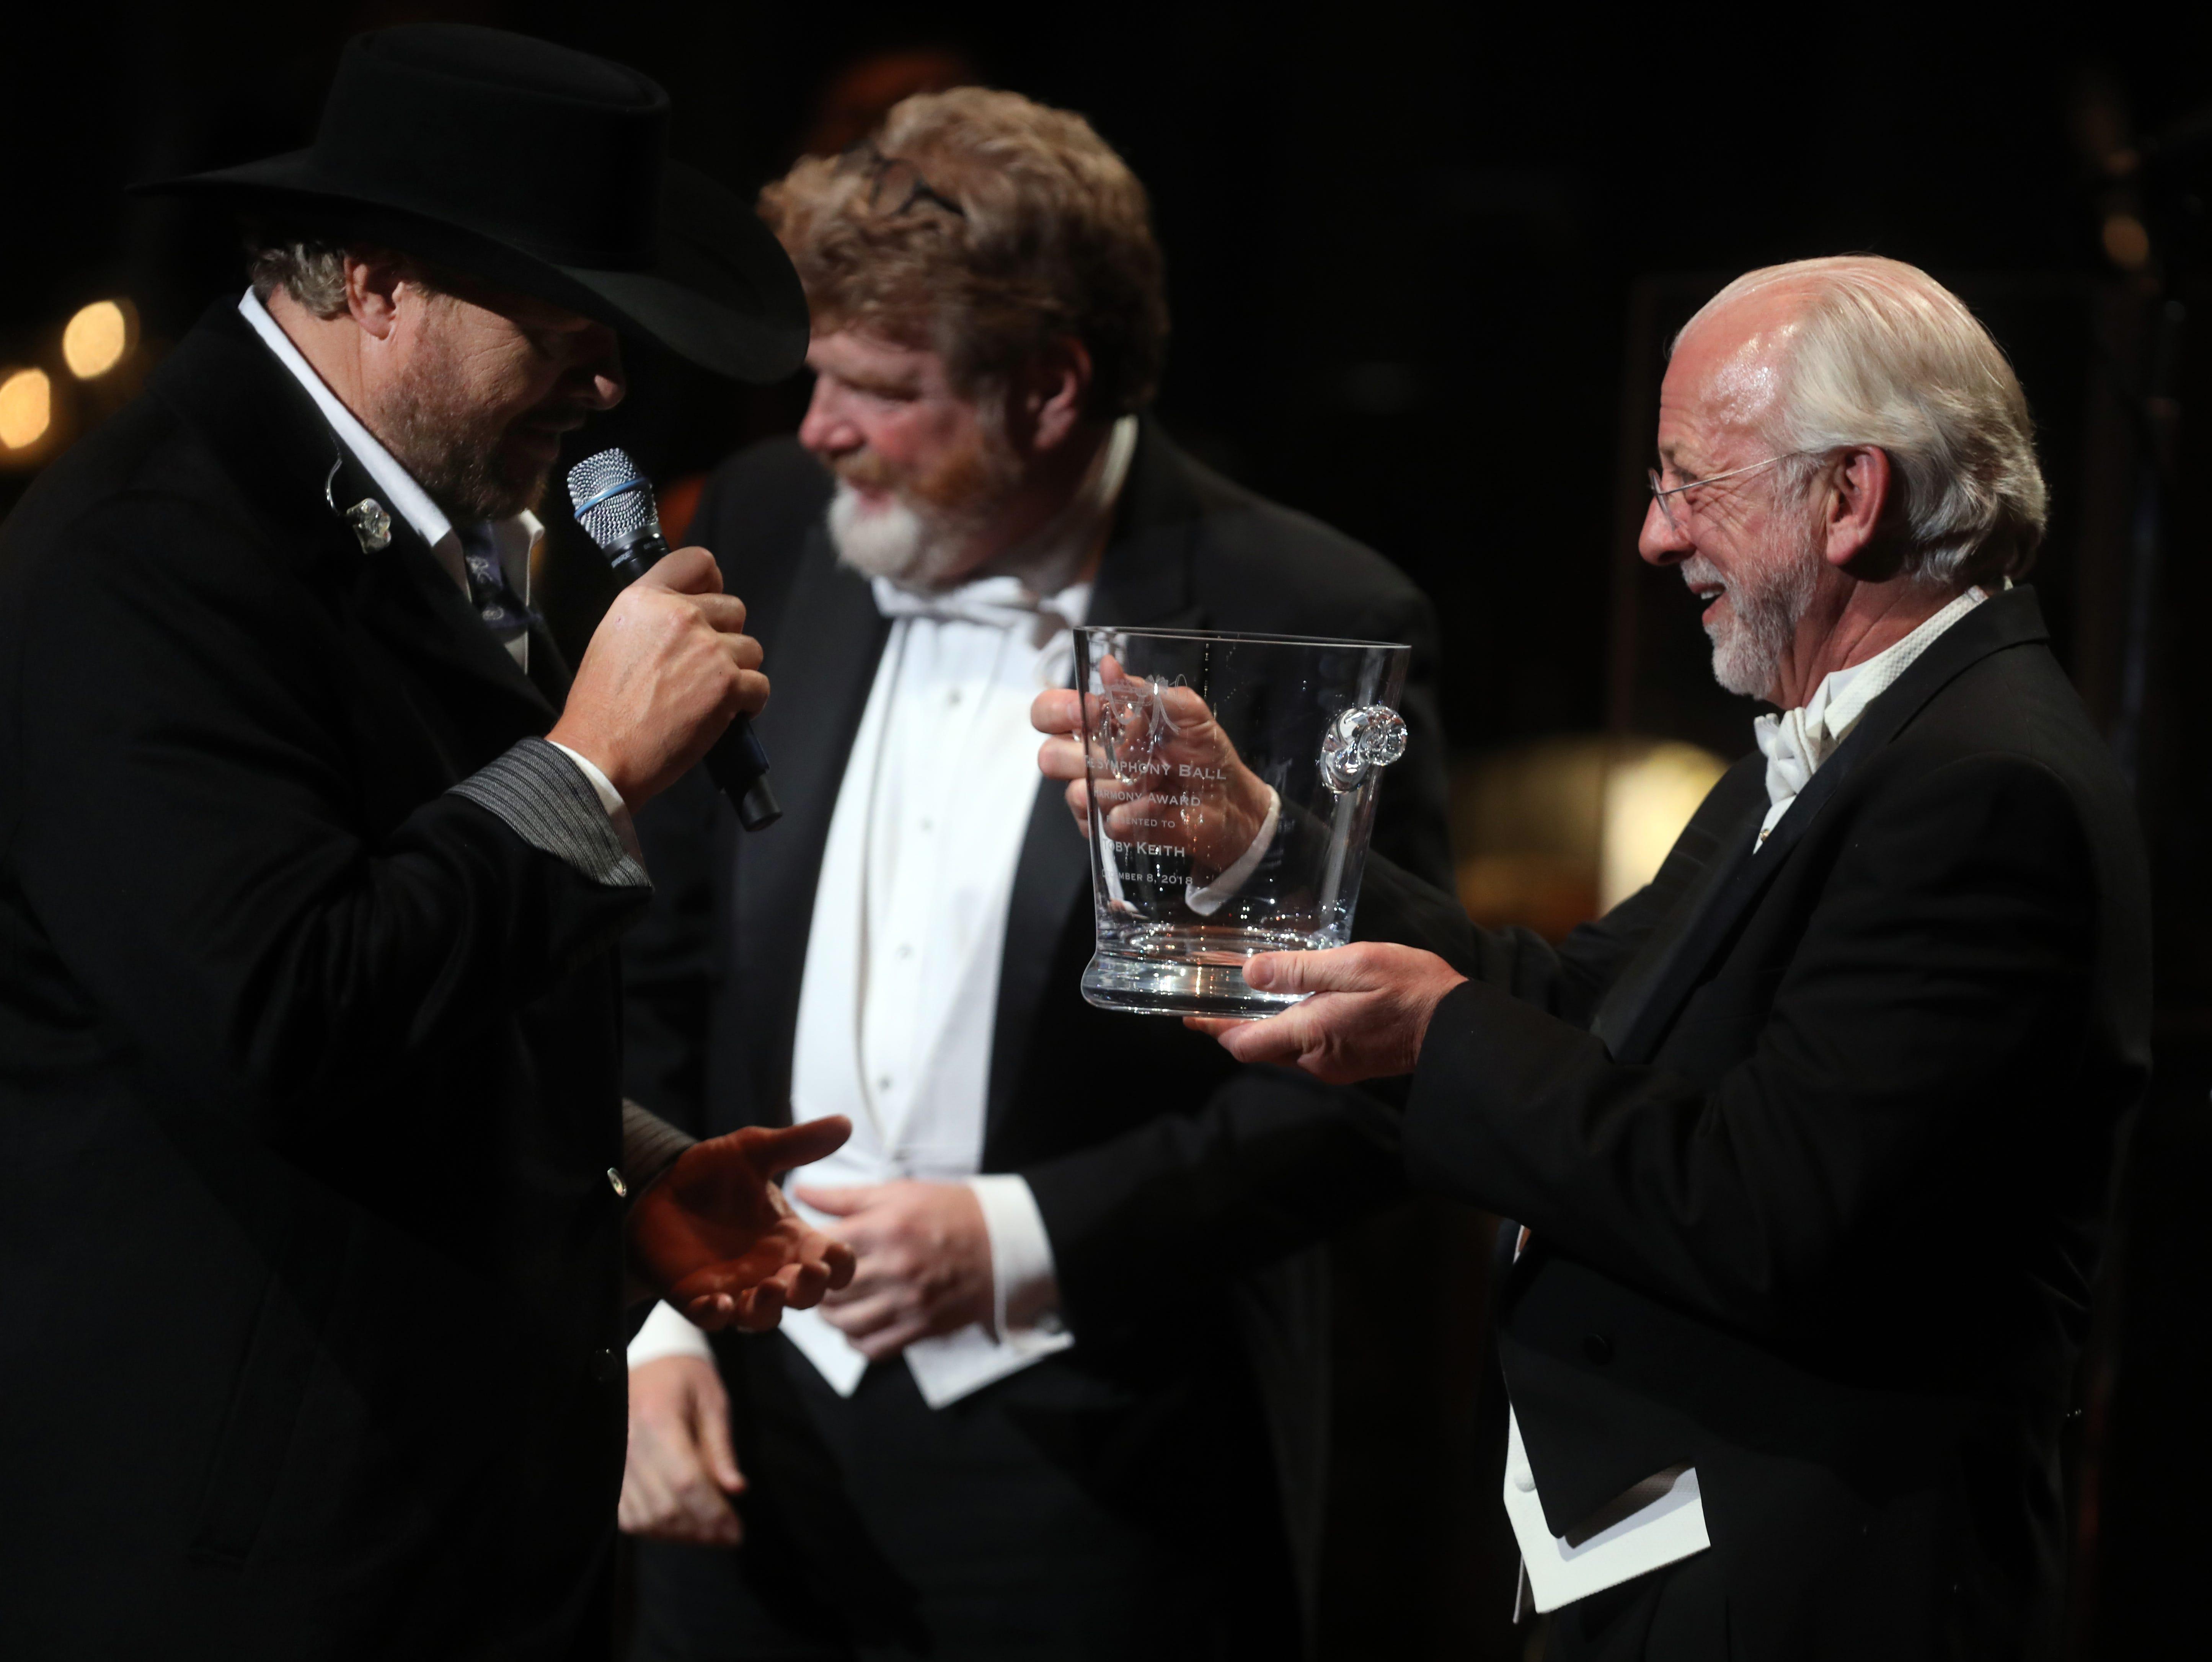 Alan Valentine presents the Nashville Symphony's 2018 Harmony Award to Toby Keith the 34th annual Symphony Ball on Saturday, December 8, 2018, at Schermerhorn Symphony Center.